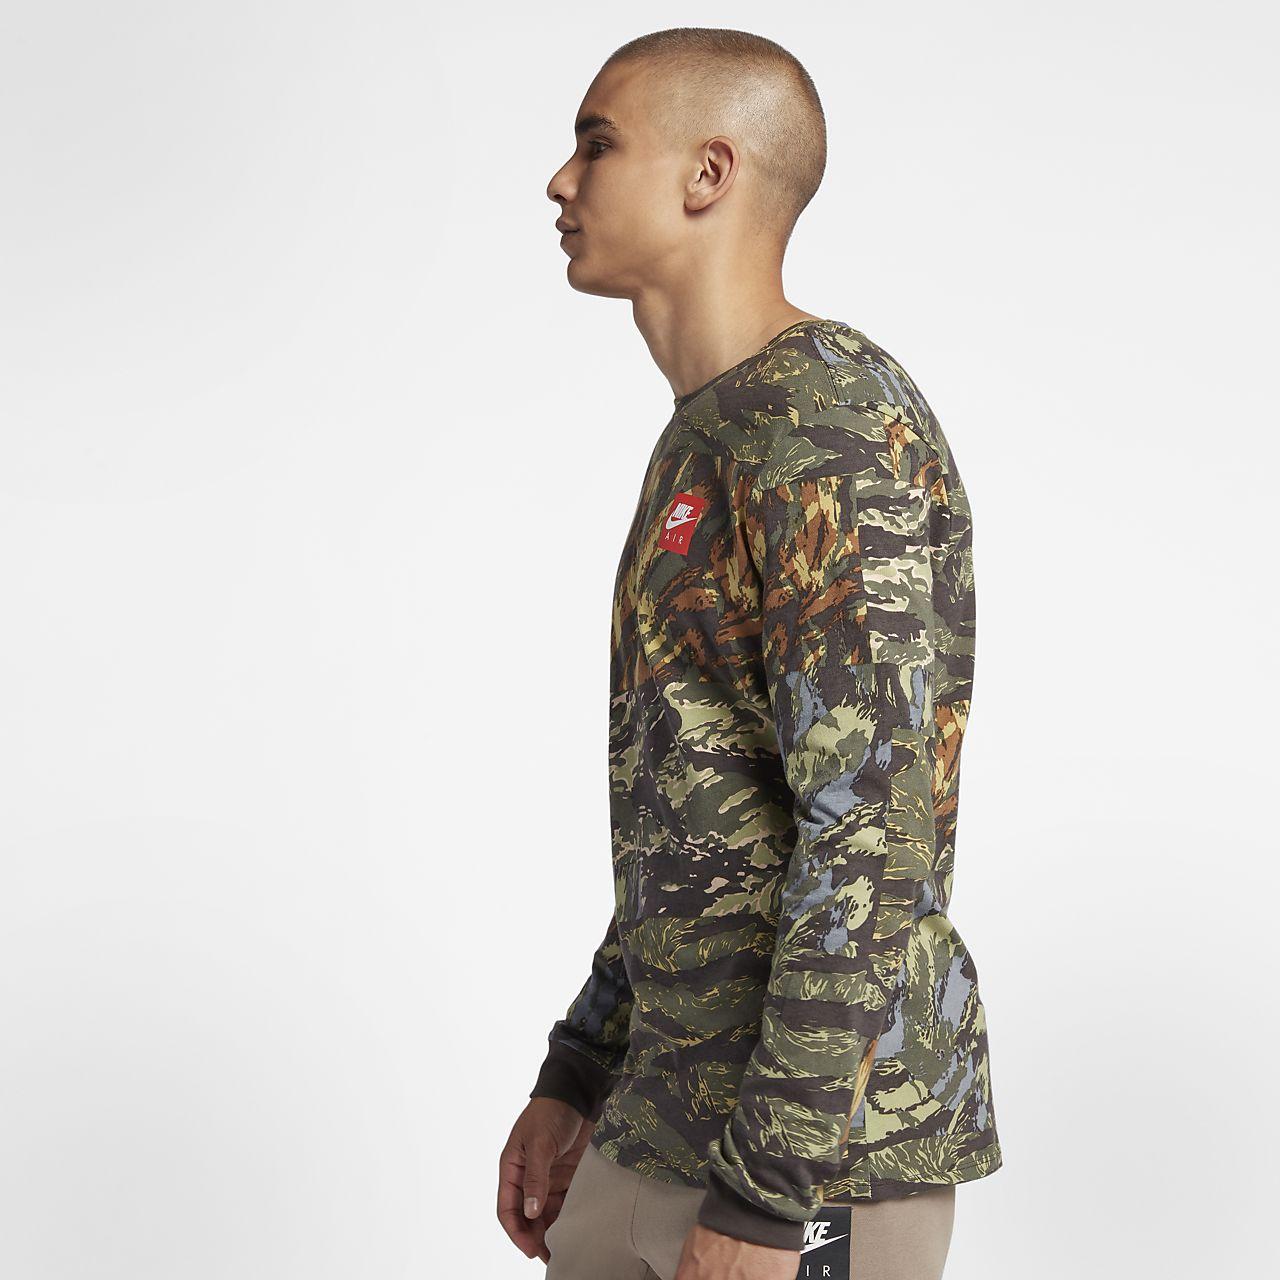 373a39f1e394 Nike Sportswear Men s Printed T-Shirt. Nike.com